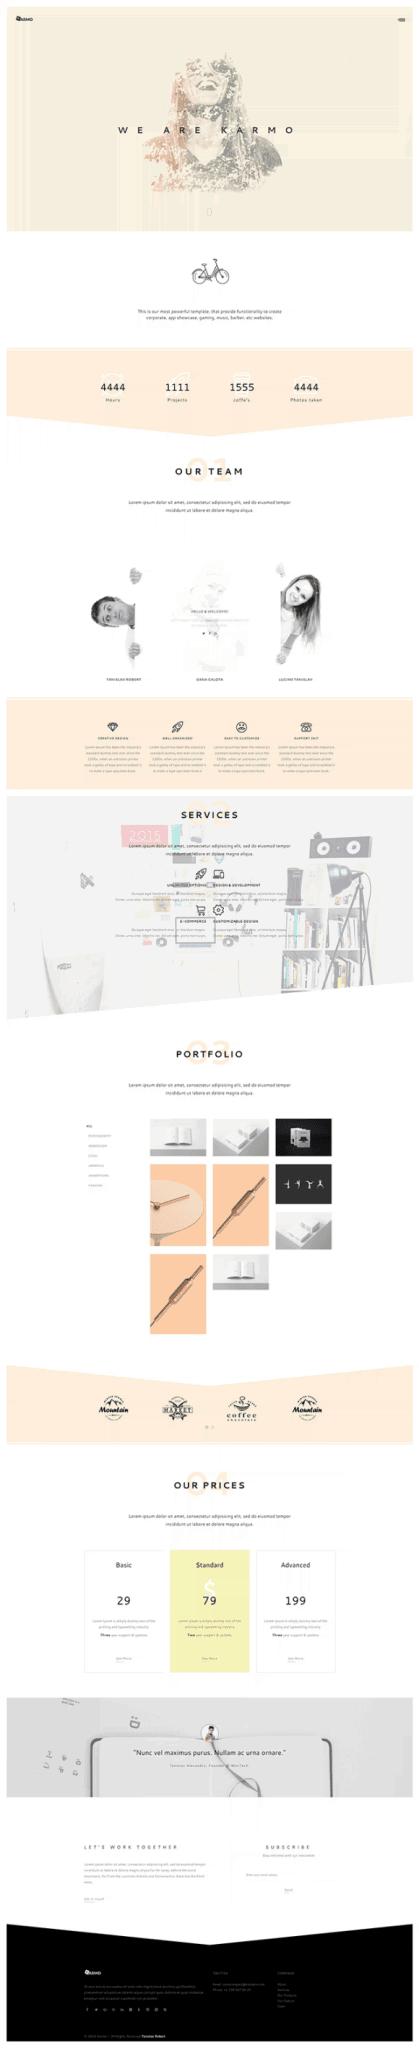 template html karmo gratuito